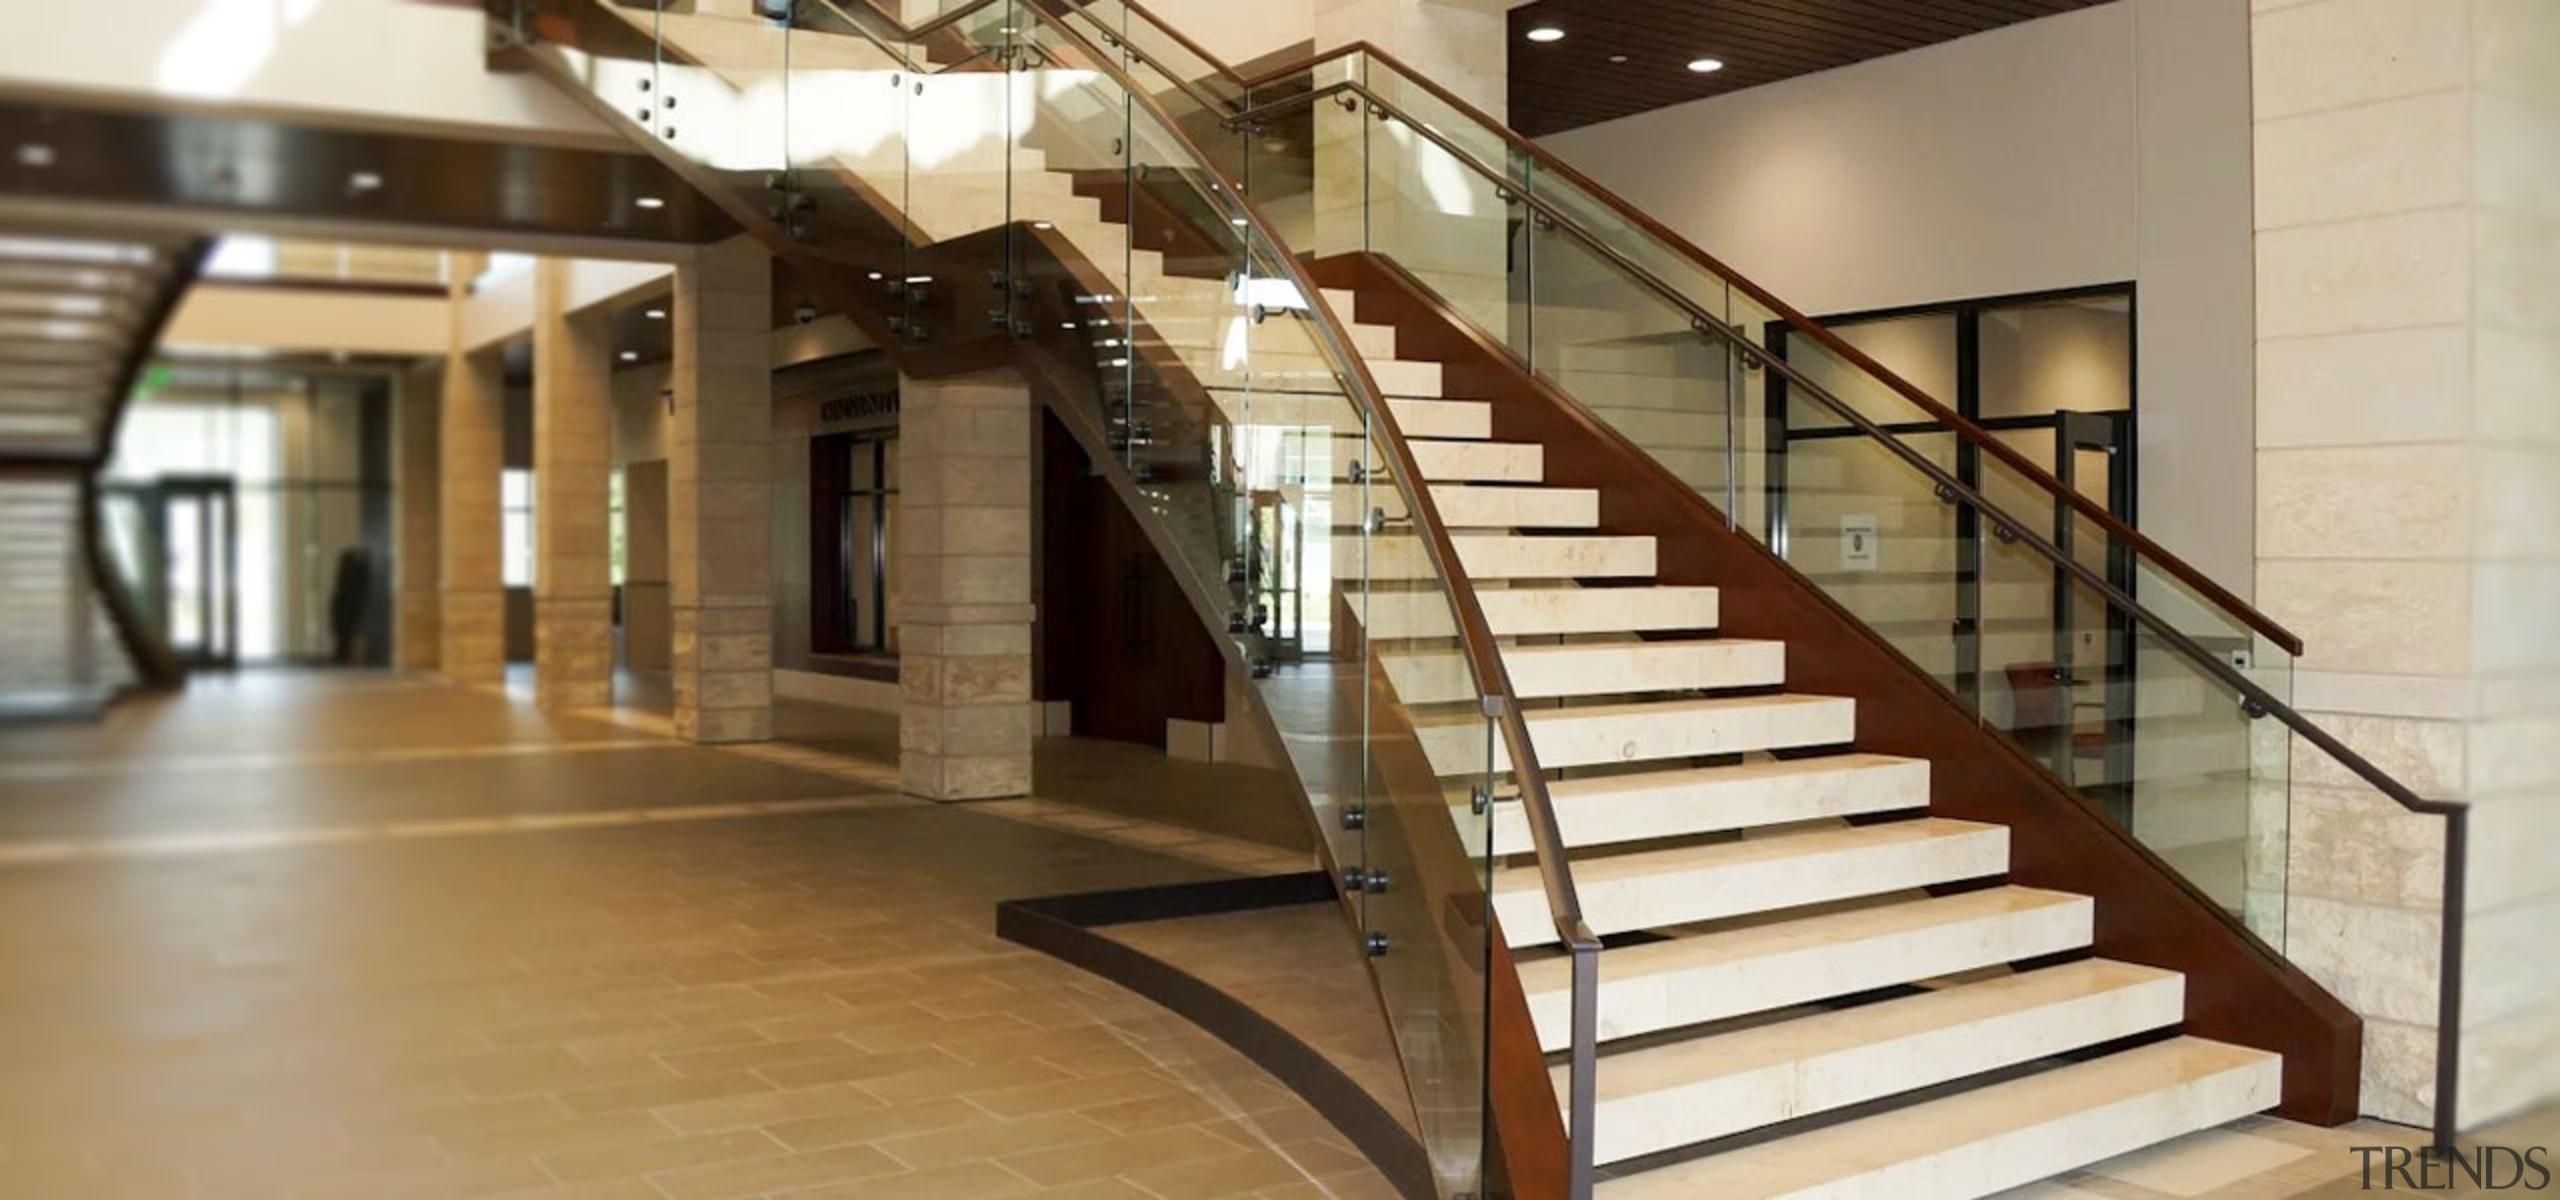 Herriman 2 - architecture | building | floor architecture, building, floor, flooring, handrail, interior design, lobby, property, stairs, brown, orange